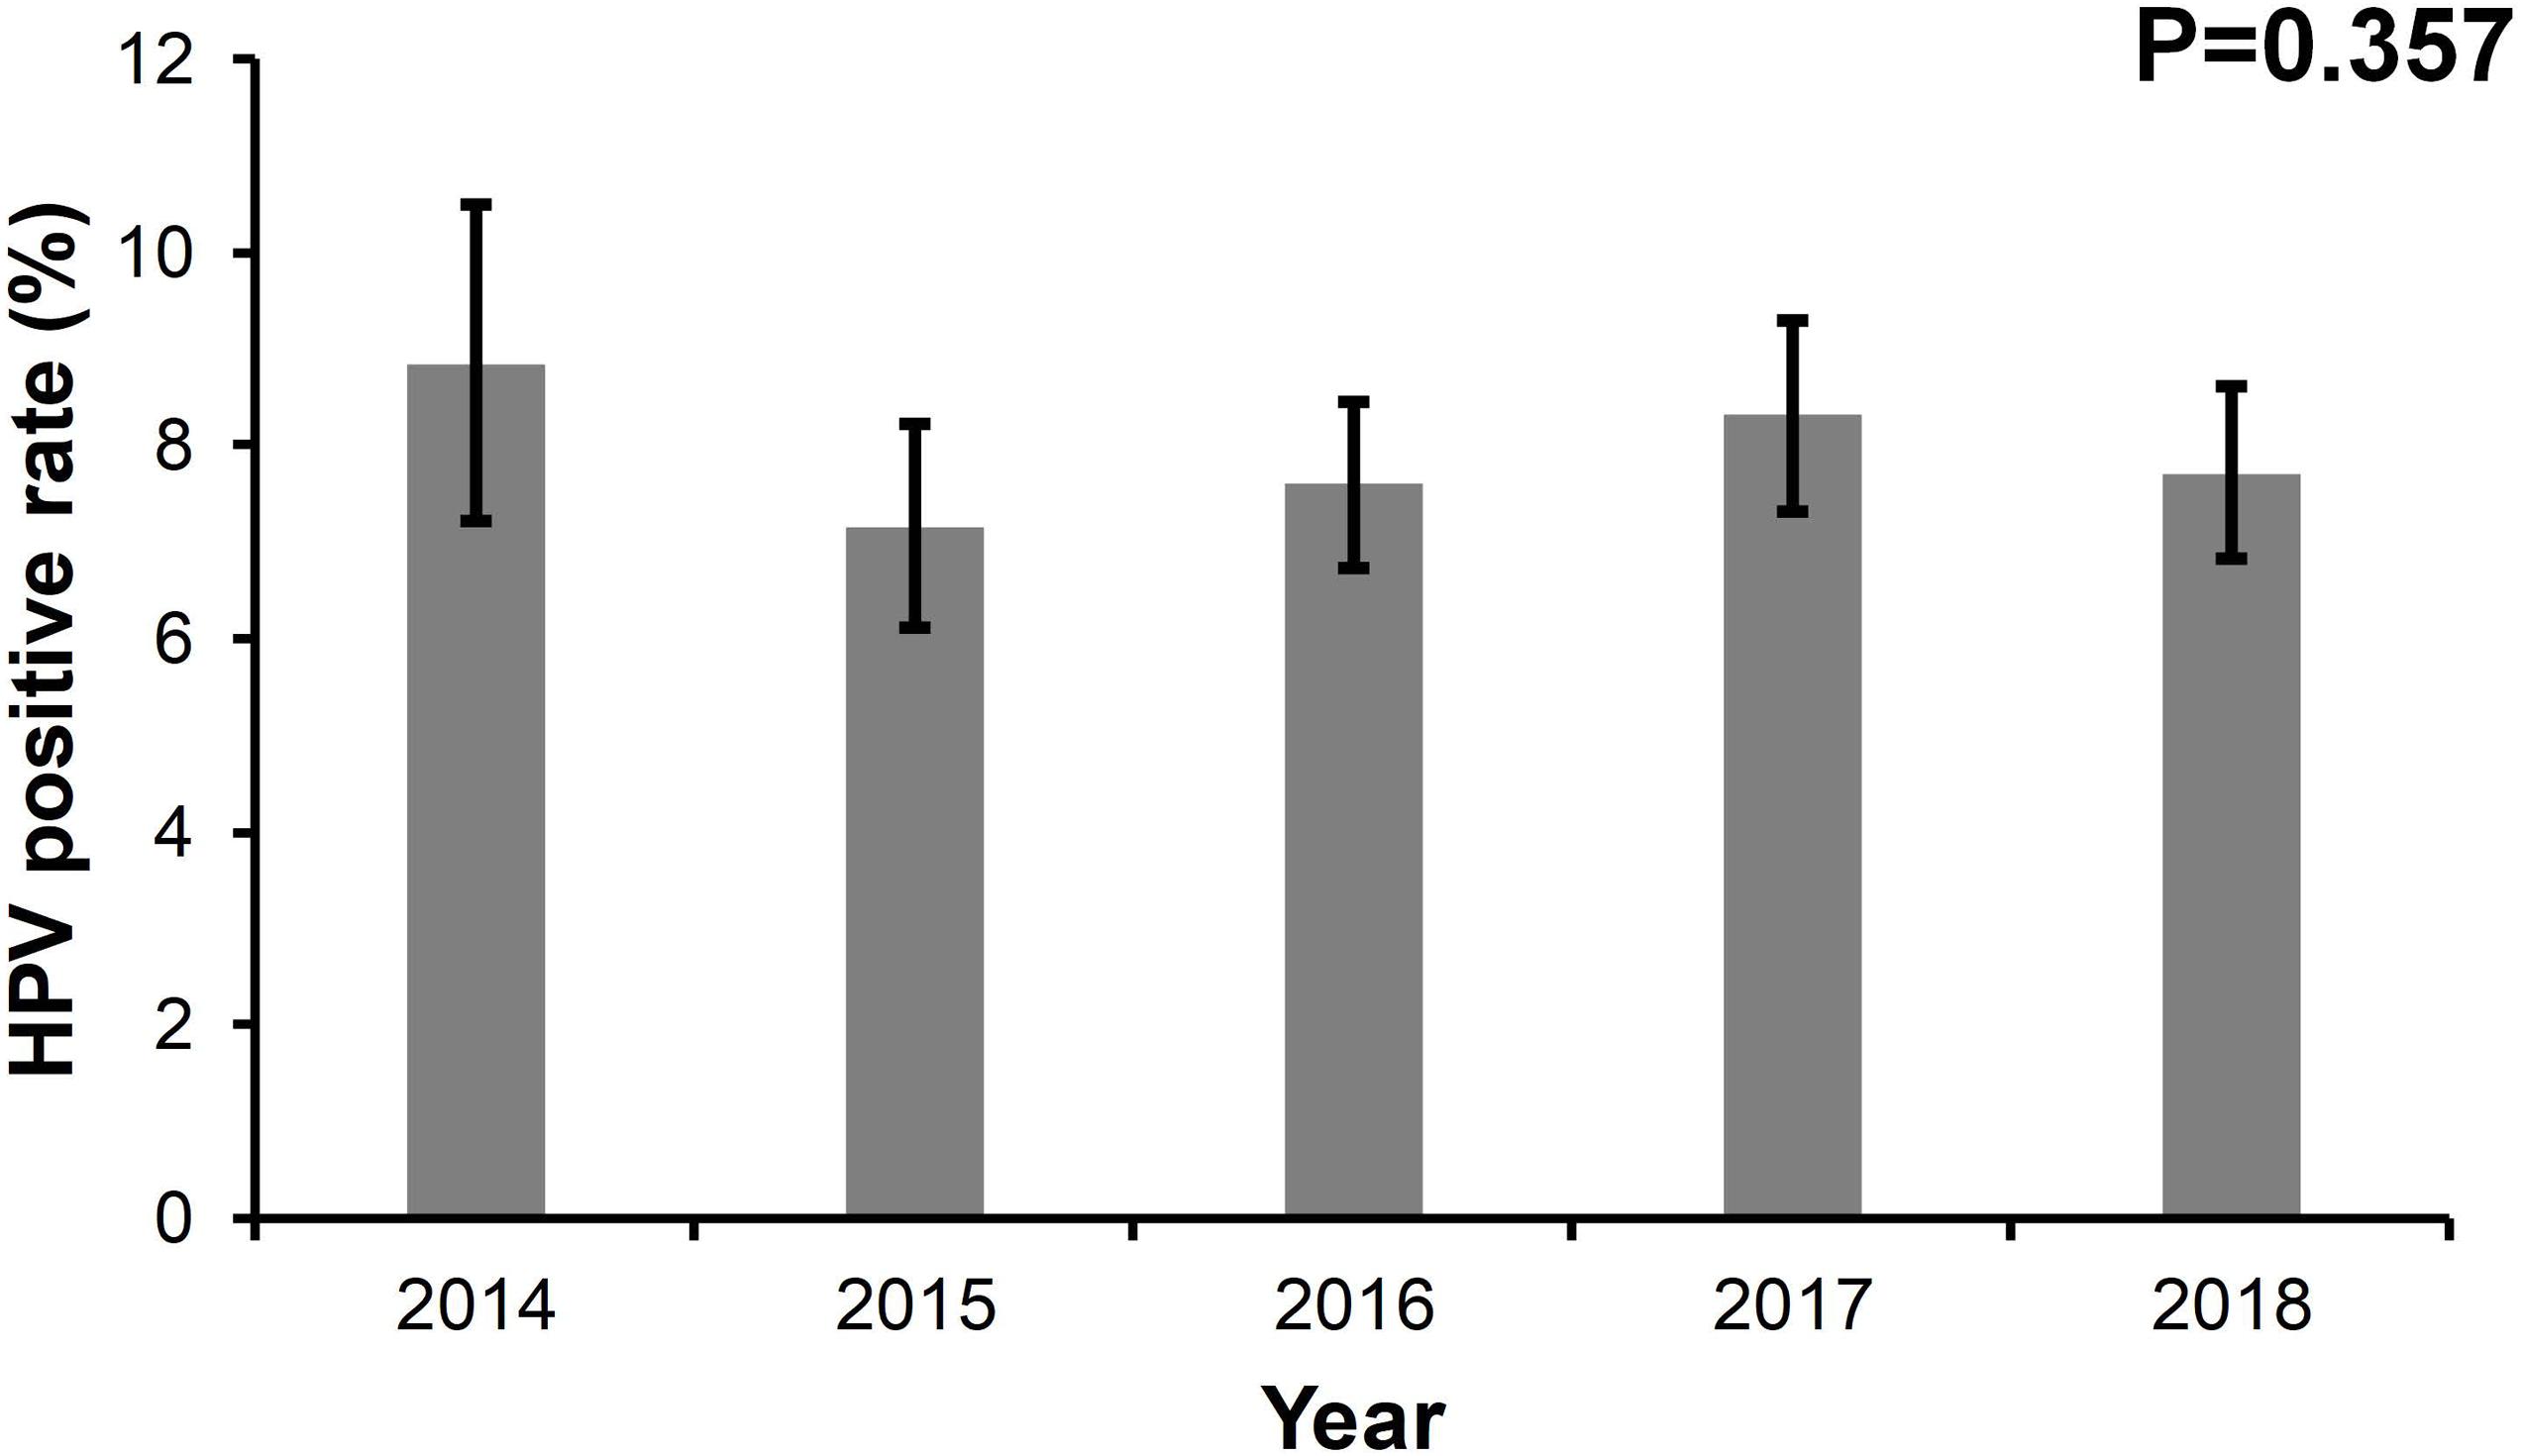 Ariella Ferrer prevalence and type distribution of human papillomavirus in